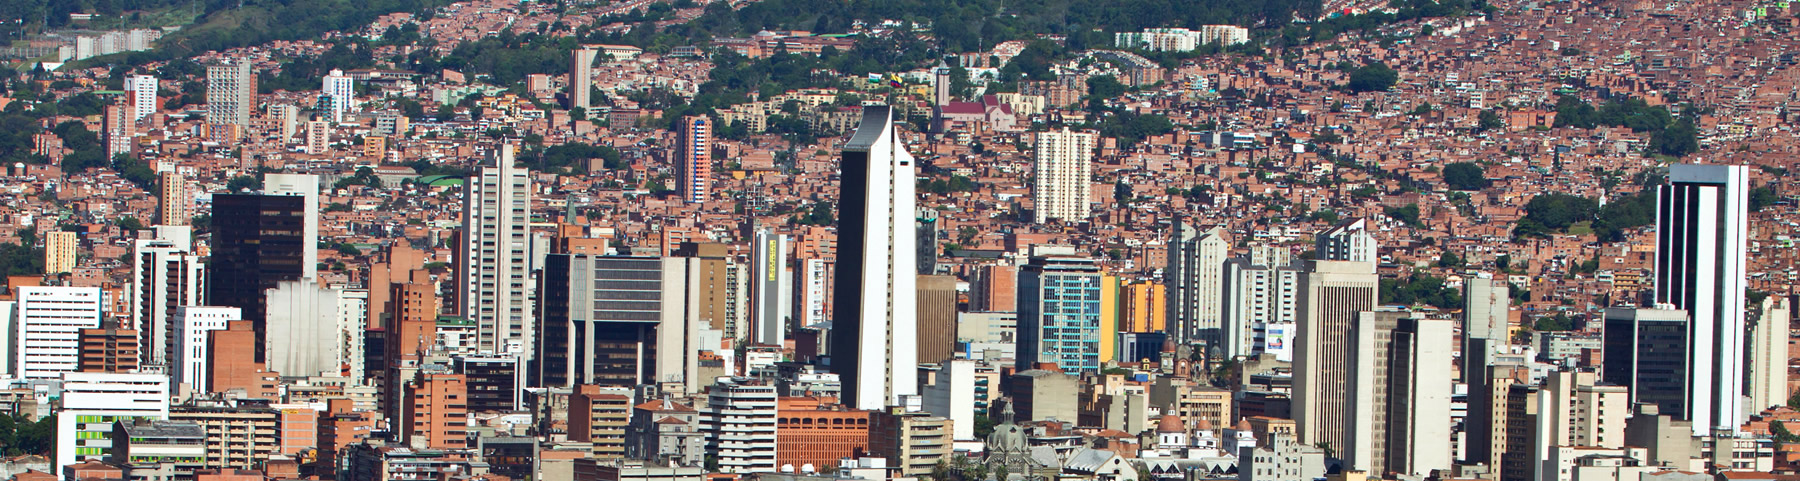 ACI Medellín